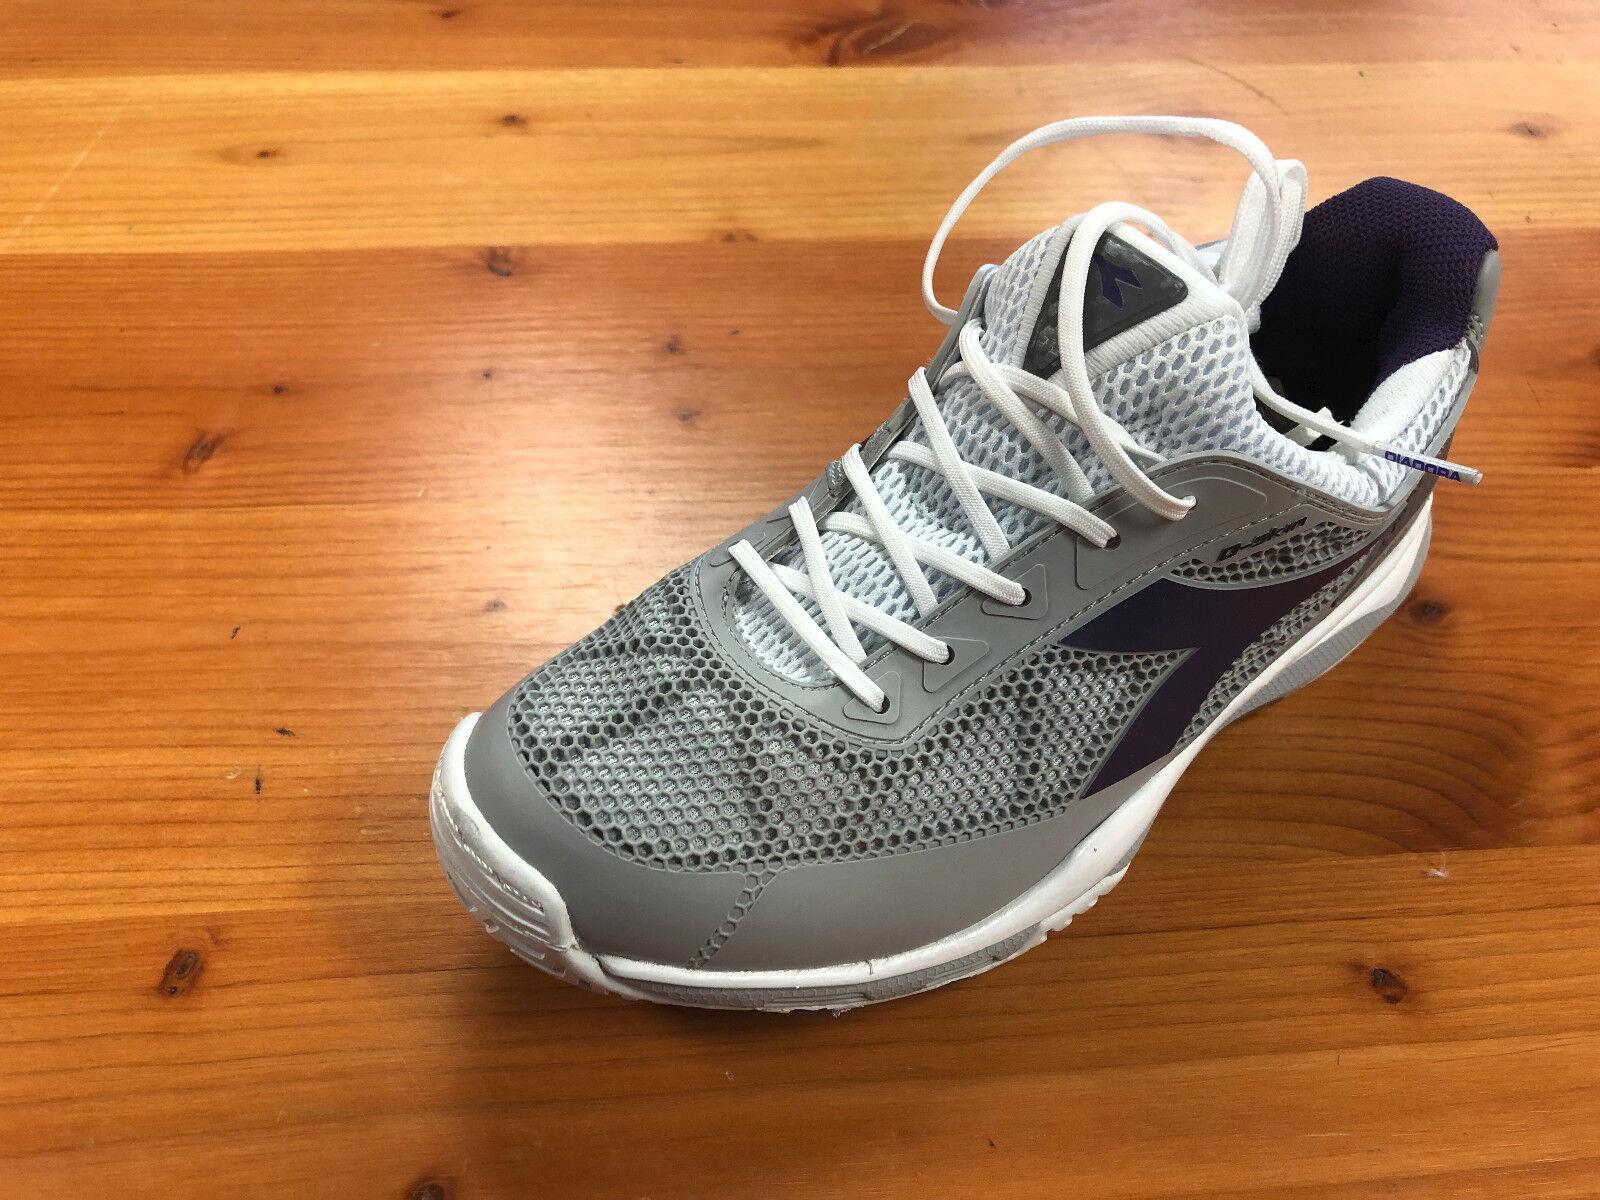 Femme Diadora S Pro Evo AG Preowned Tennis Chaussures